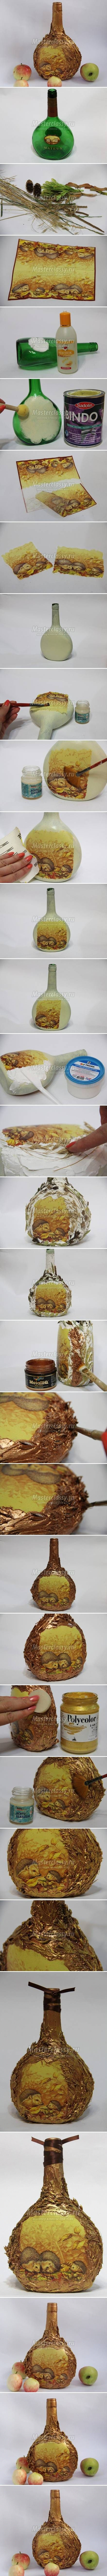 DIY Autumn Bottle Decoupage